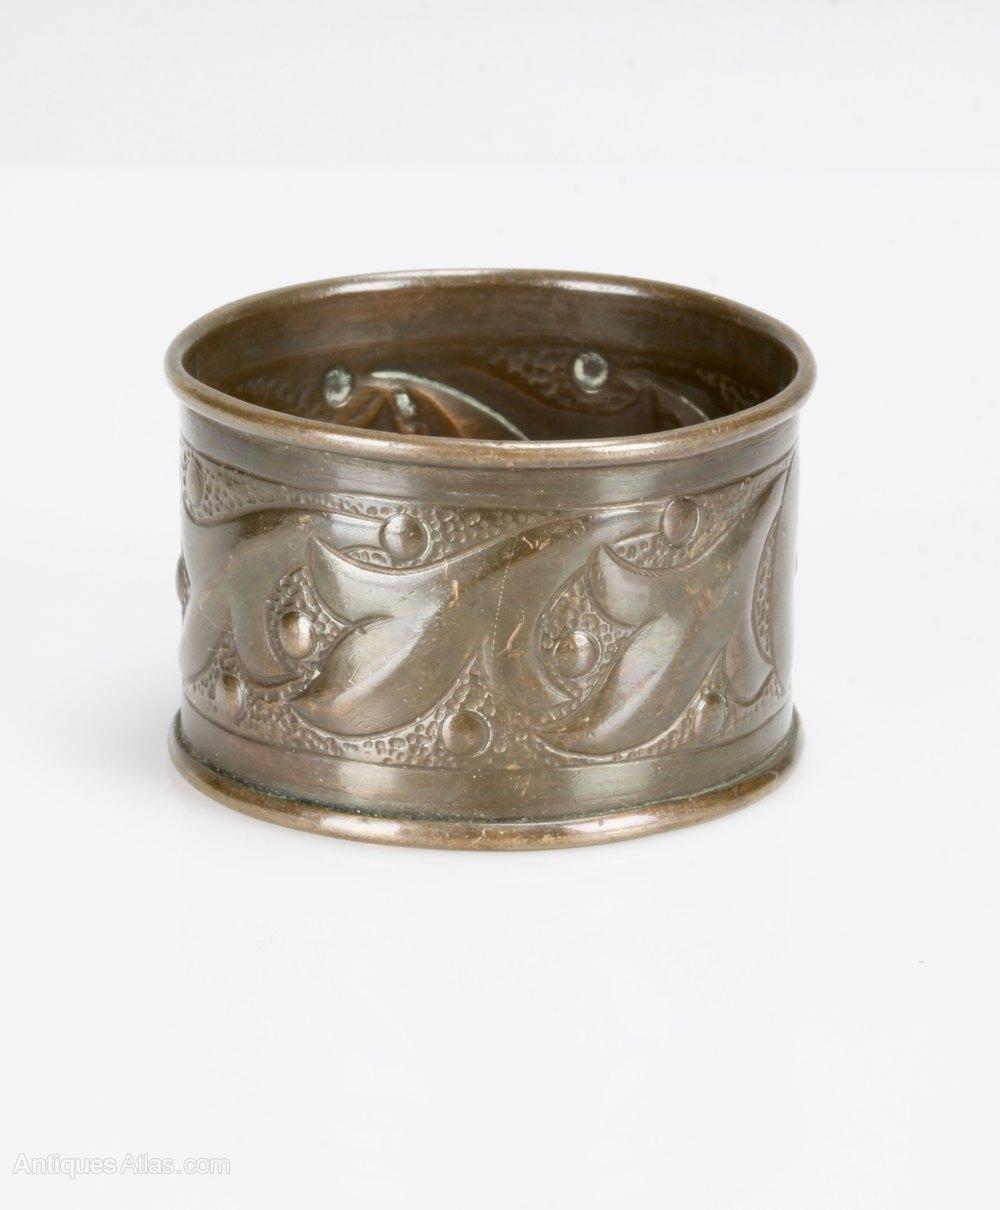 Antiques Atlas Keswick Arts Crafts Copper Napkin Ring